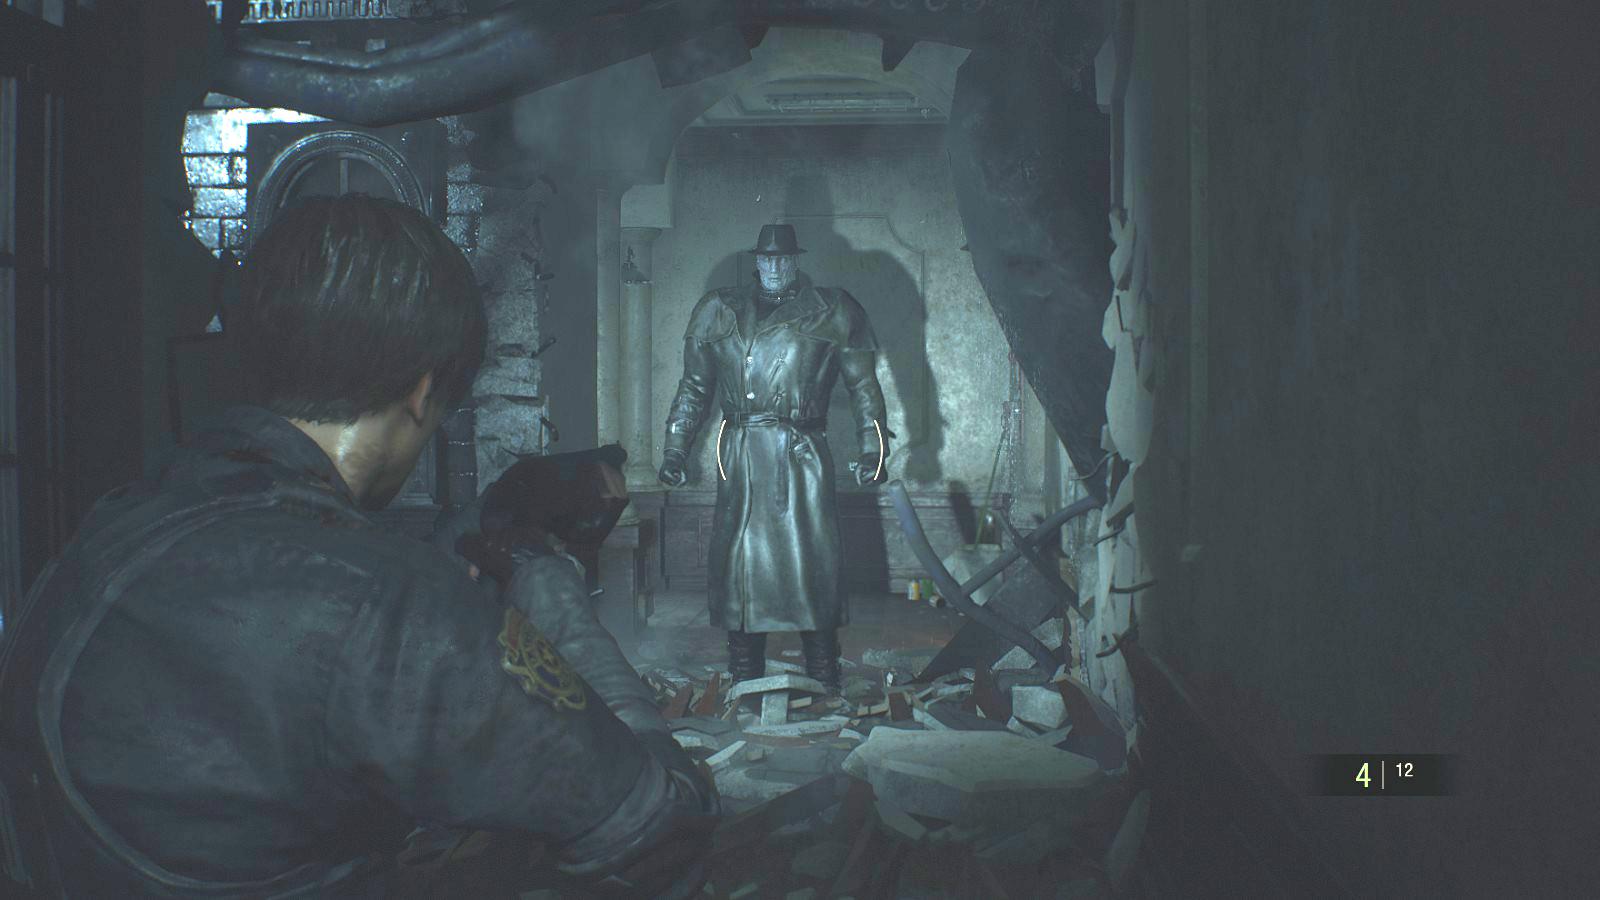 Latest Resident Evil 2 Mr X Mod Removes Him Completely